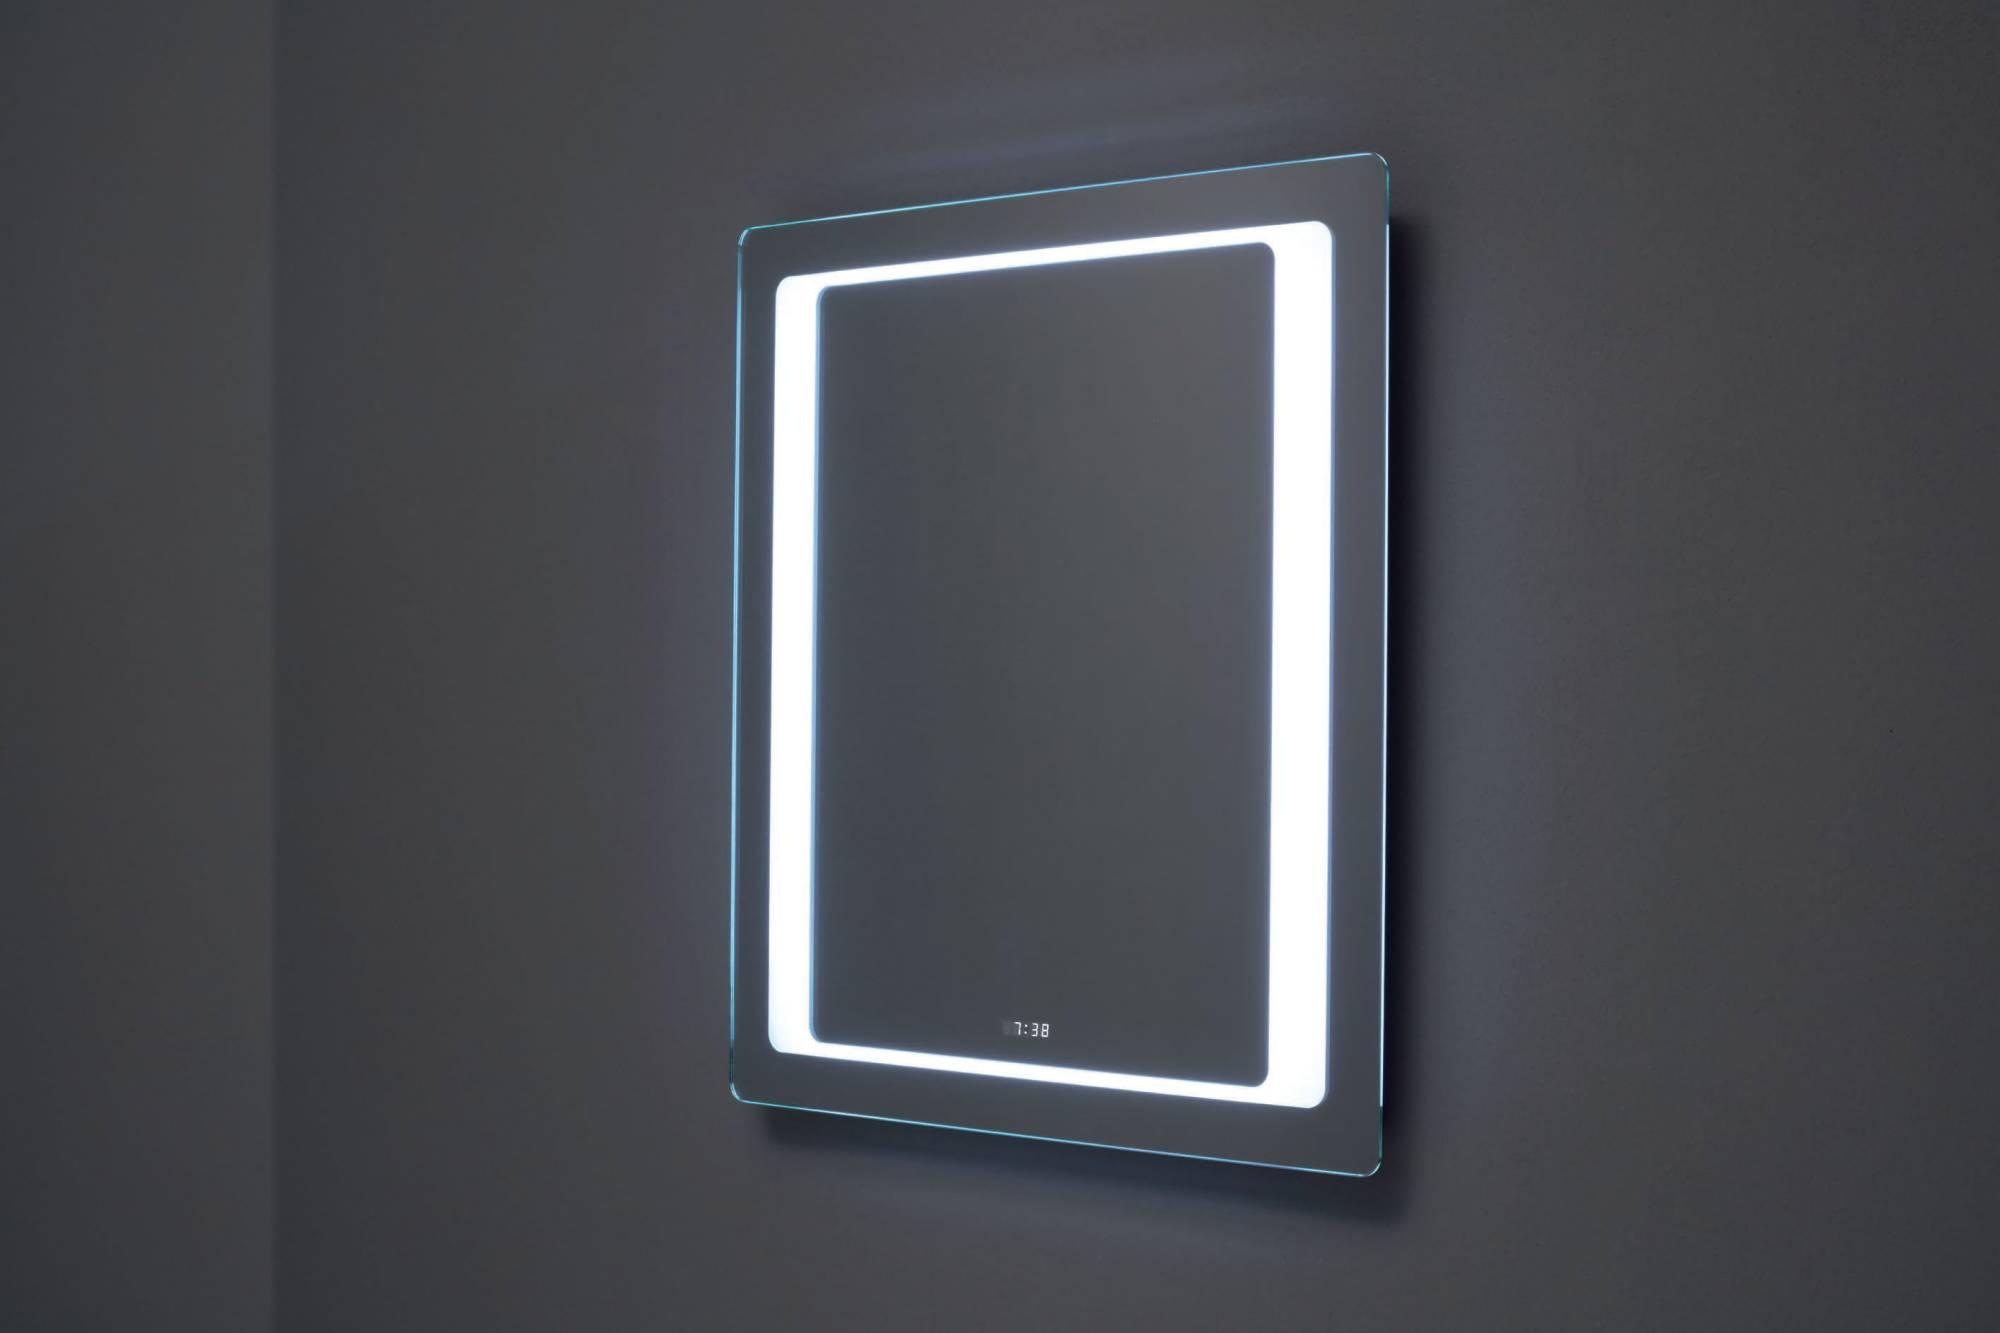 miroir_aquila_80_x_60_kit_bluetooth_horloge_numérique_antibuée